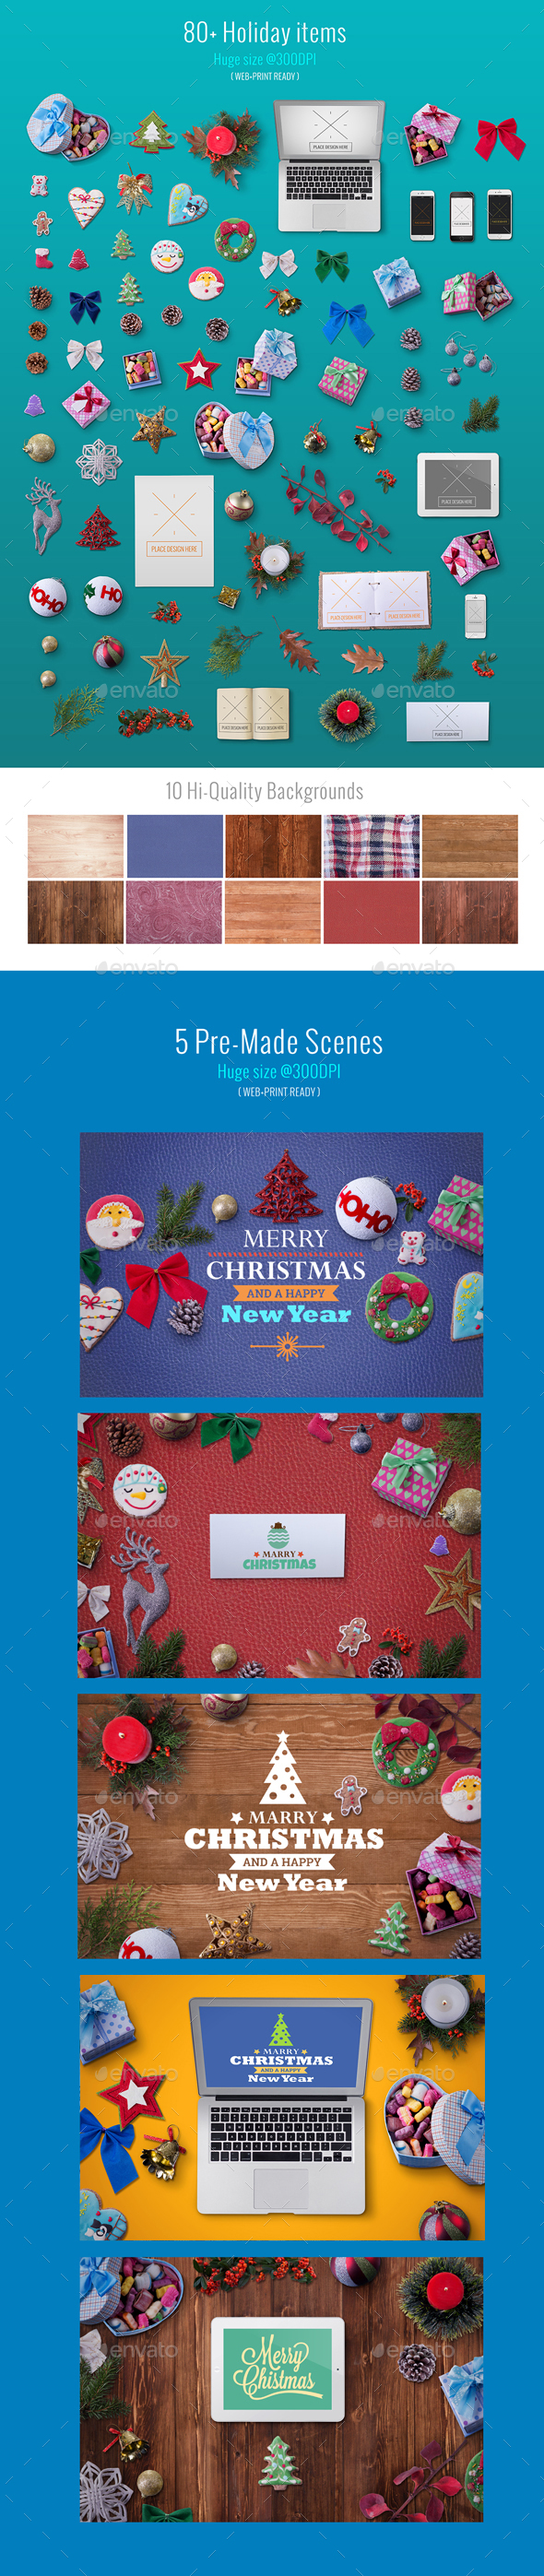 Winter Holidays Scene Generator psd postcard